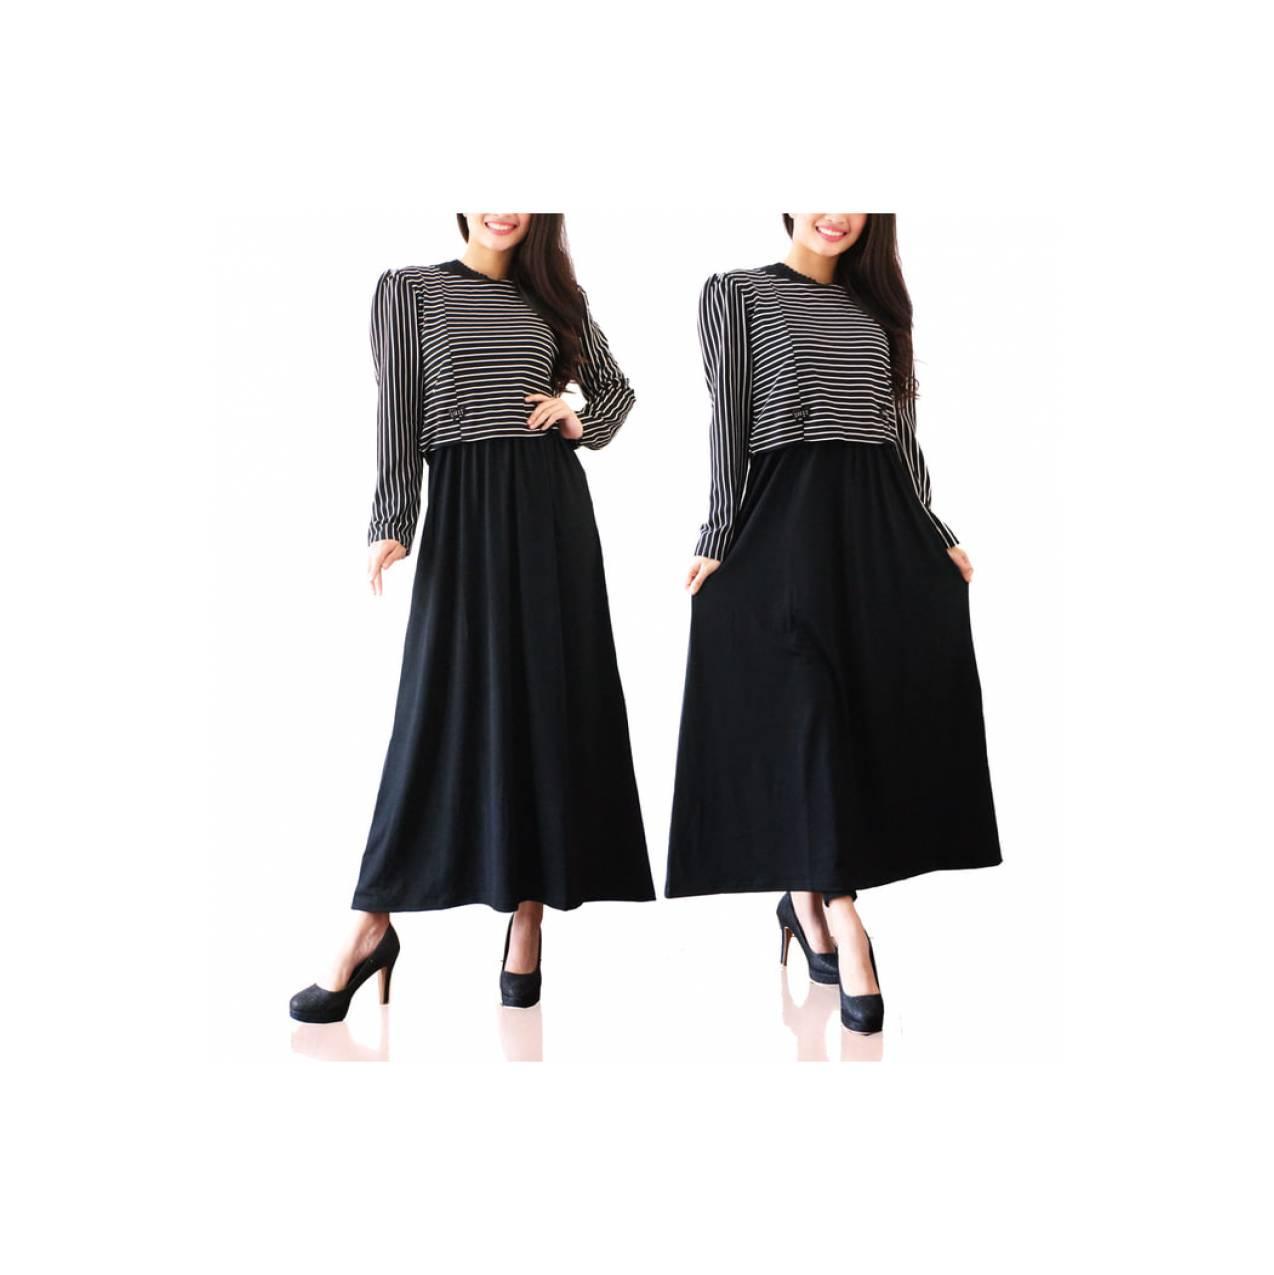 Gamis Maxi Zaskia / Baju / Dress / Busana Muslim / Strip Hitam / Abaya